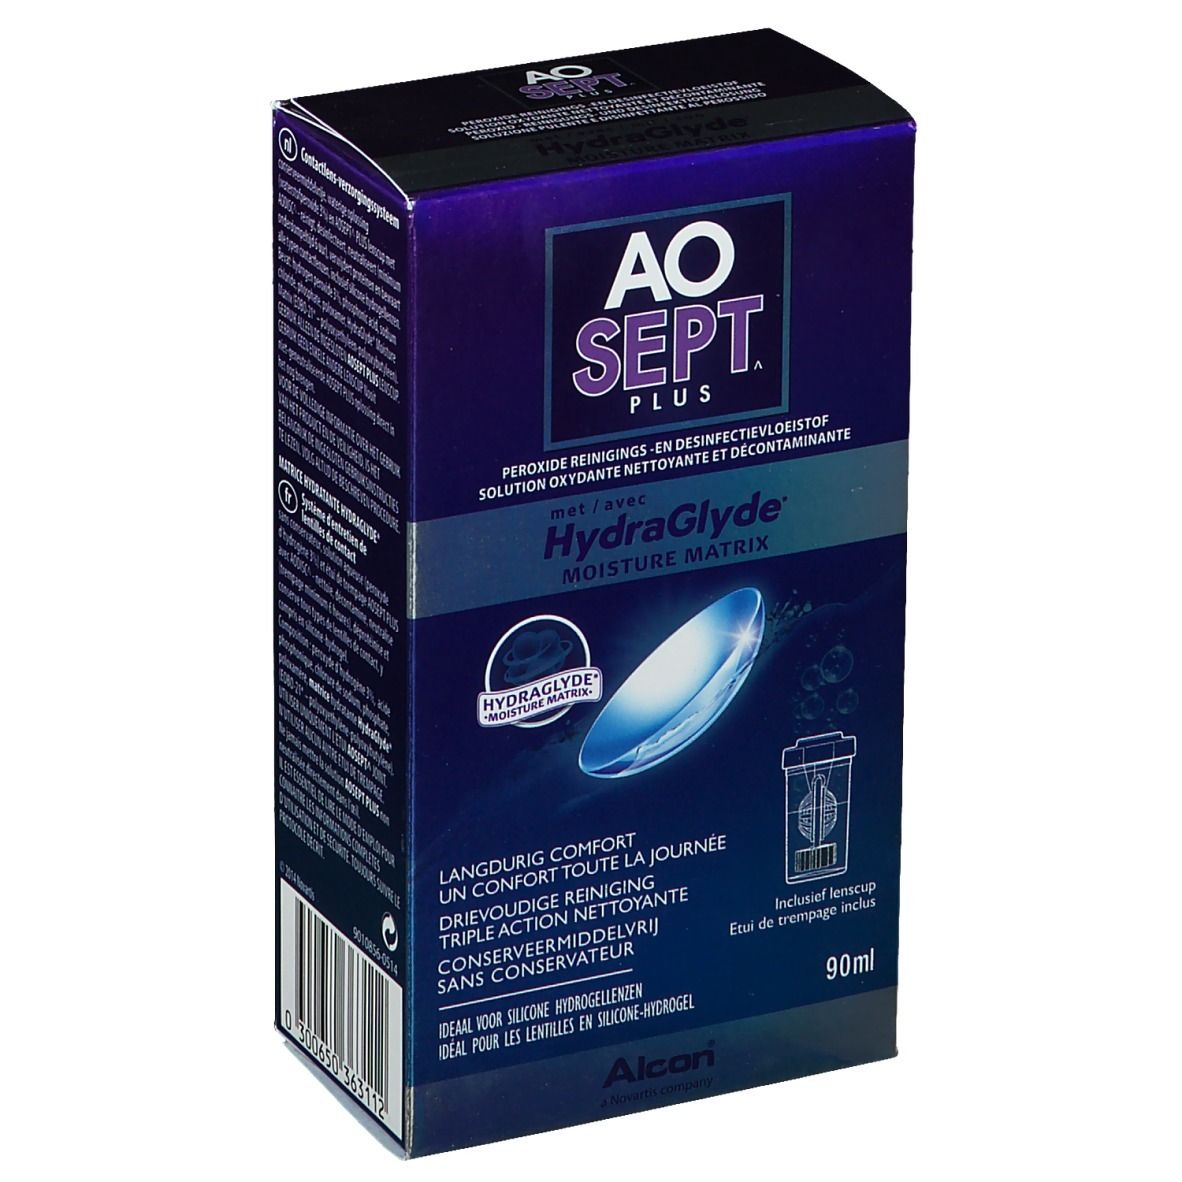 Image of Aosept Plus mit HydraClyde + Kontaktlinsenbehälter